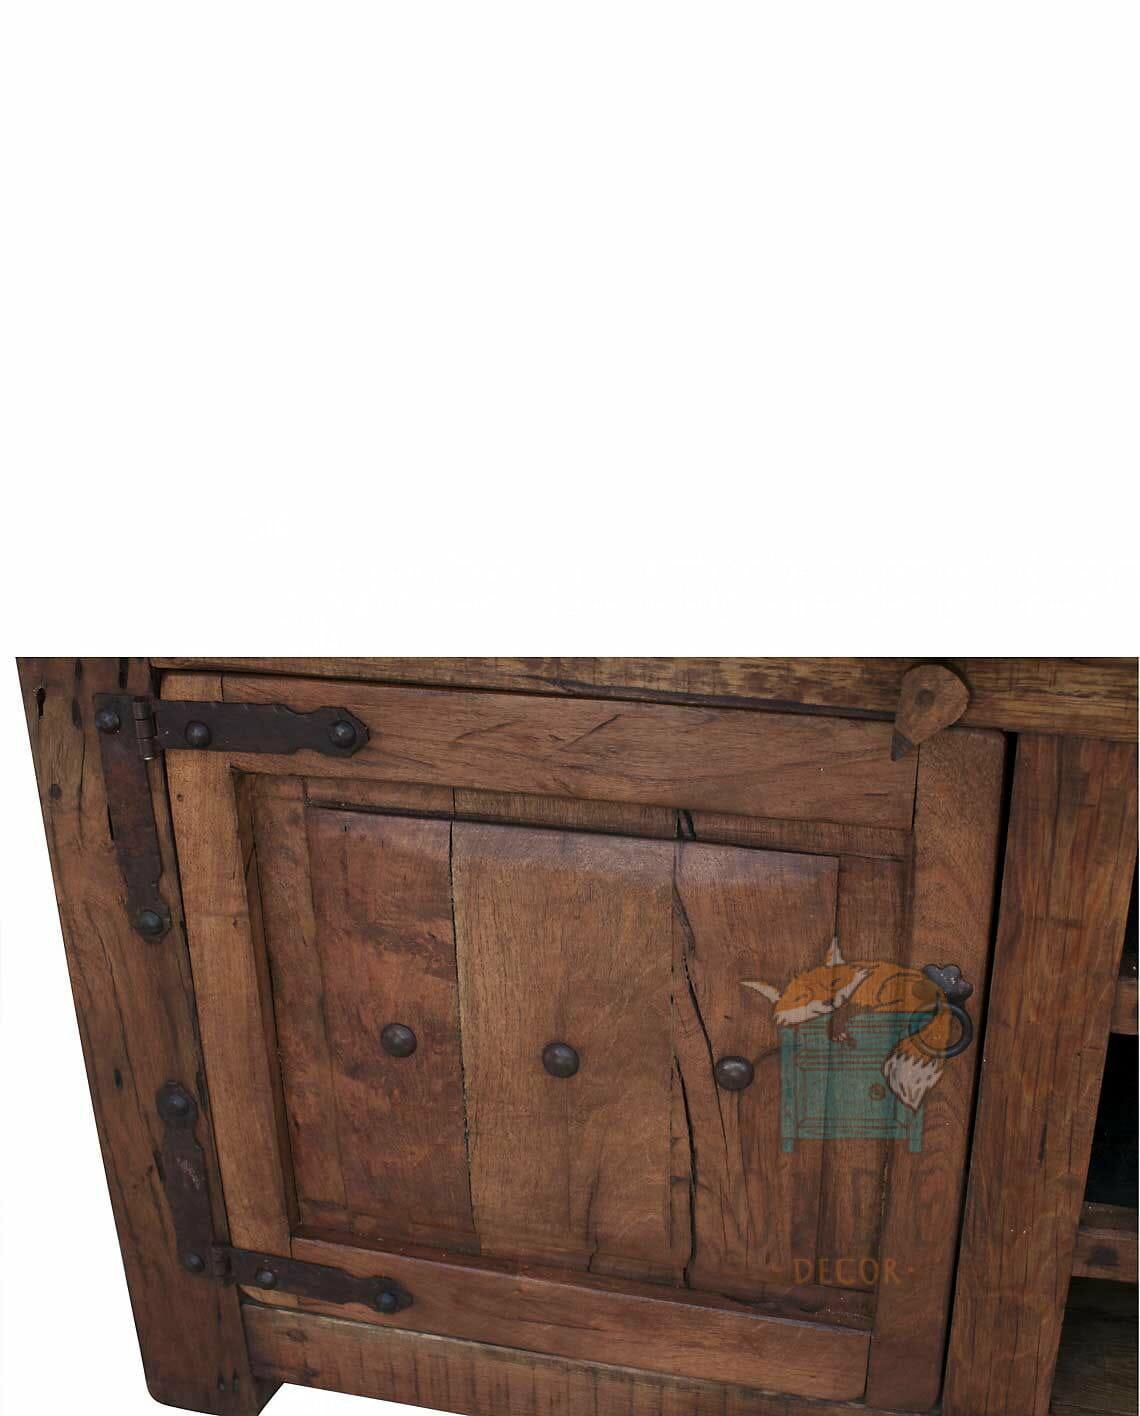 Buy Alton Double Sink Vanity Online Mesquite Wood Vanity